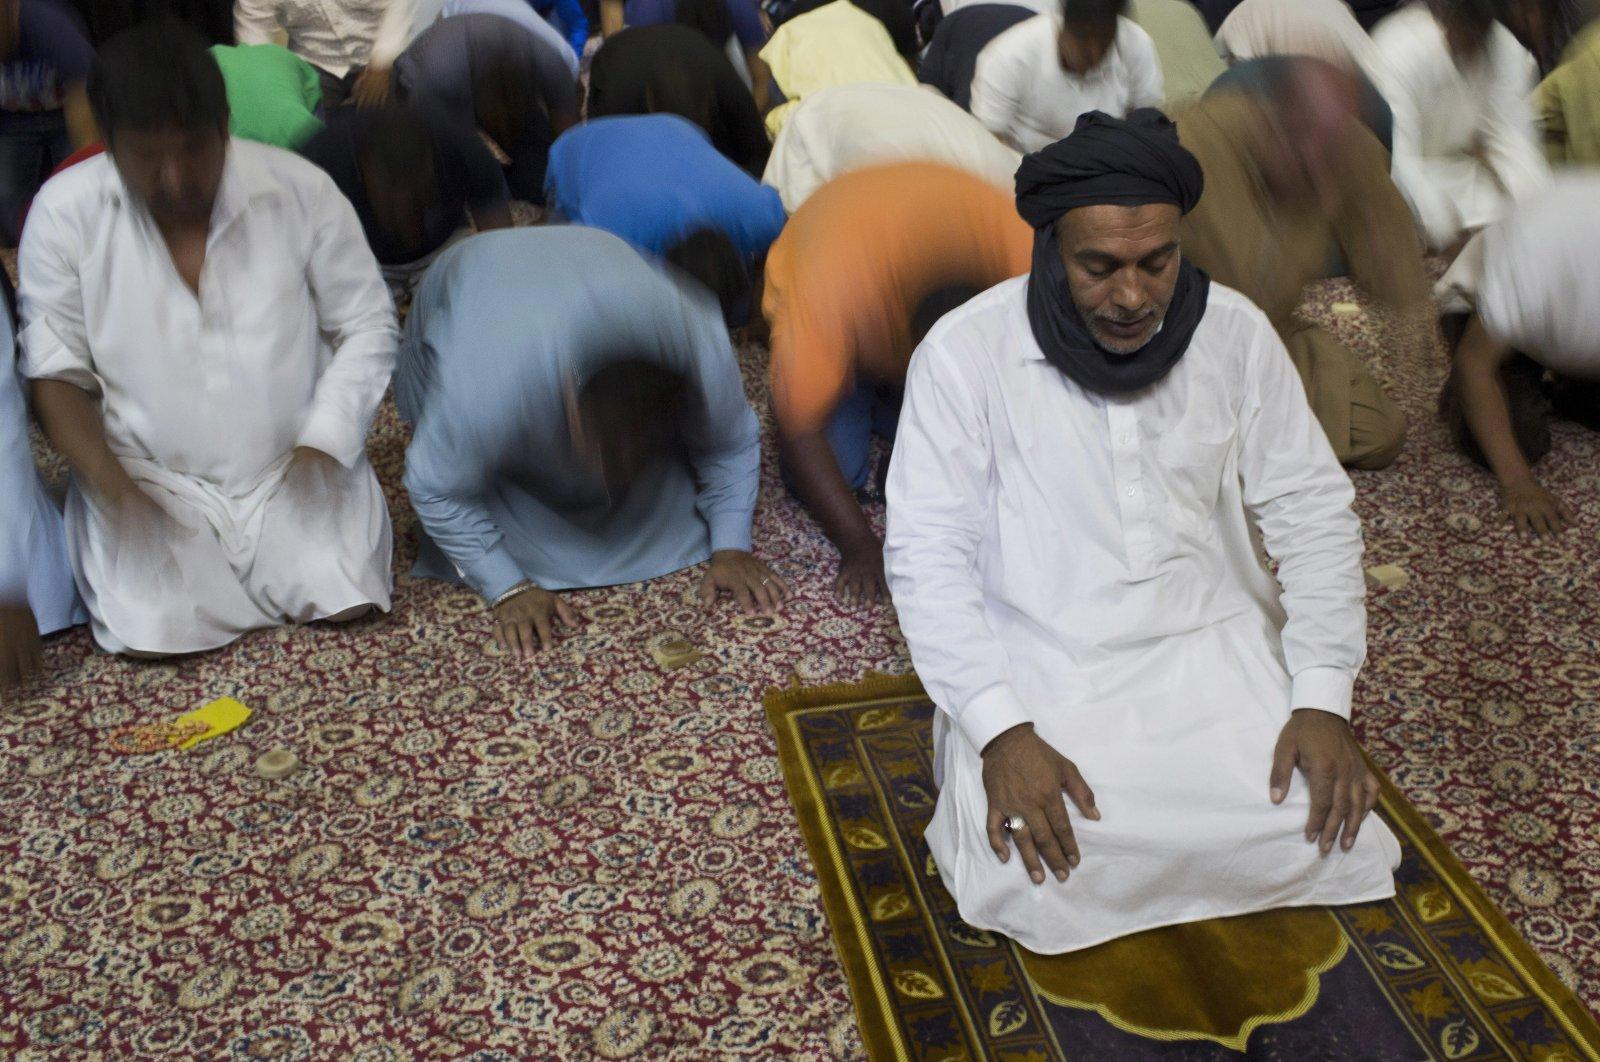 Sunni Muslims living in Greece pray on the first day of Eid al-Fitr (Ramadan Bayram) prayers in Piraeus, near Athens, July. 6, 2016. (AP Photo)